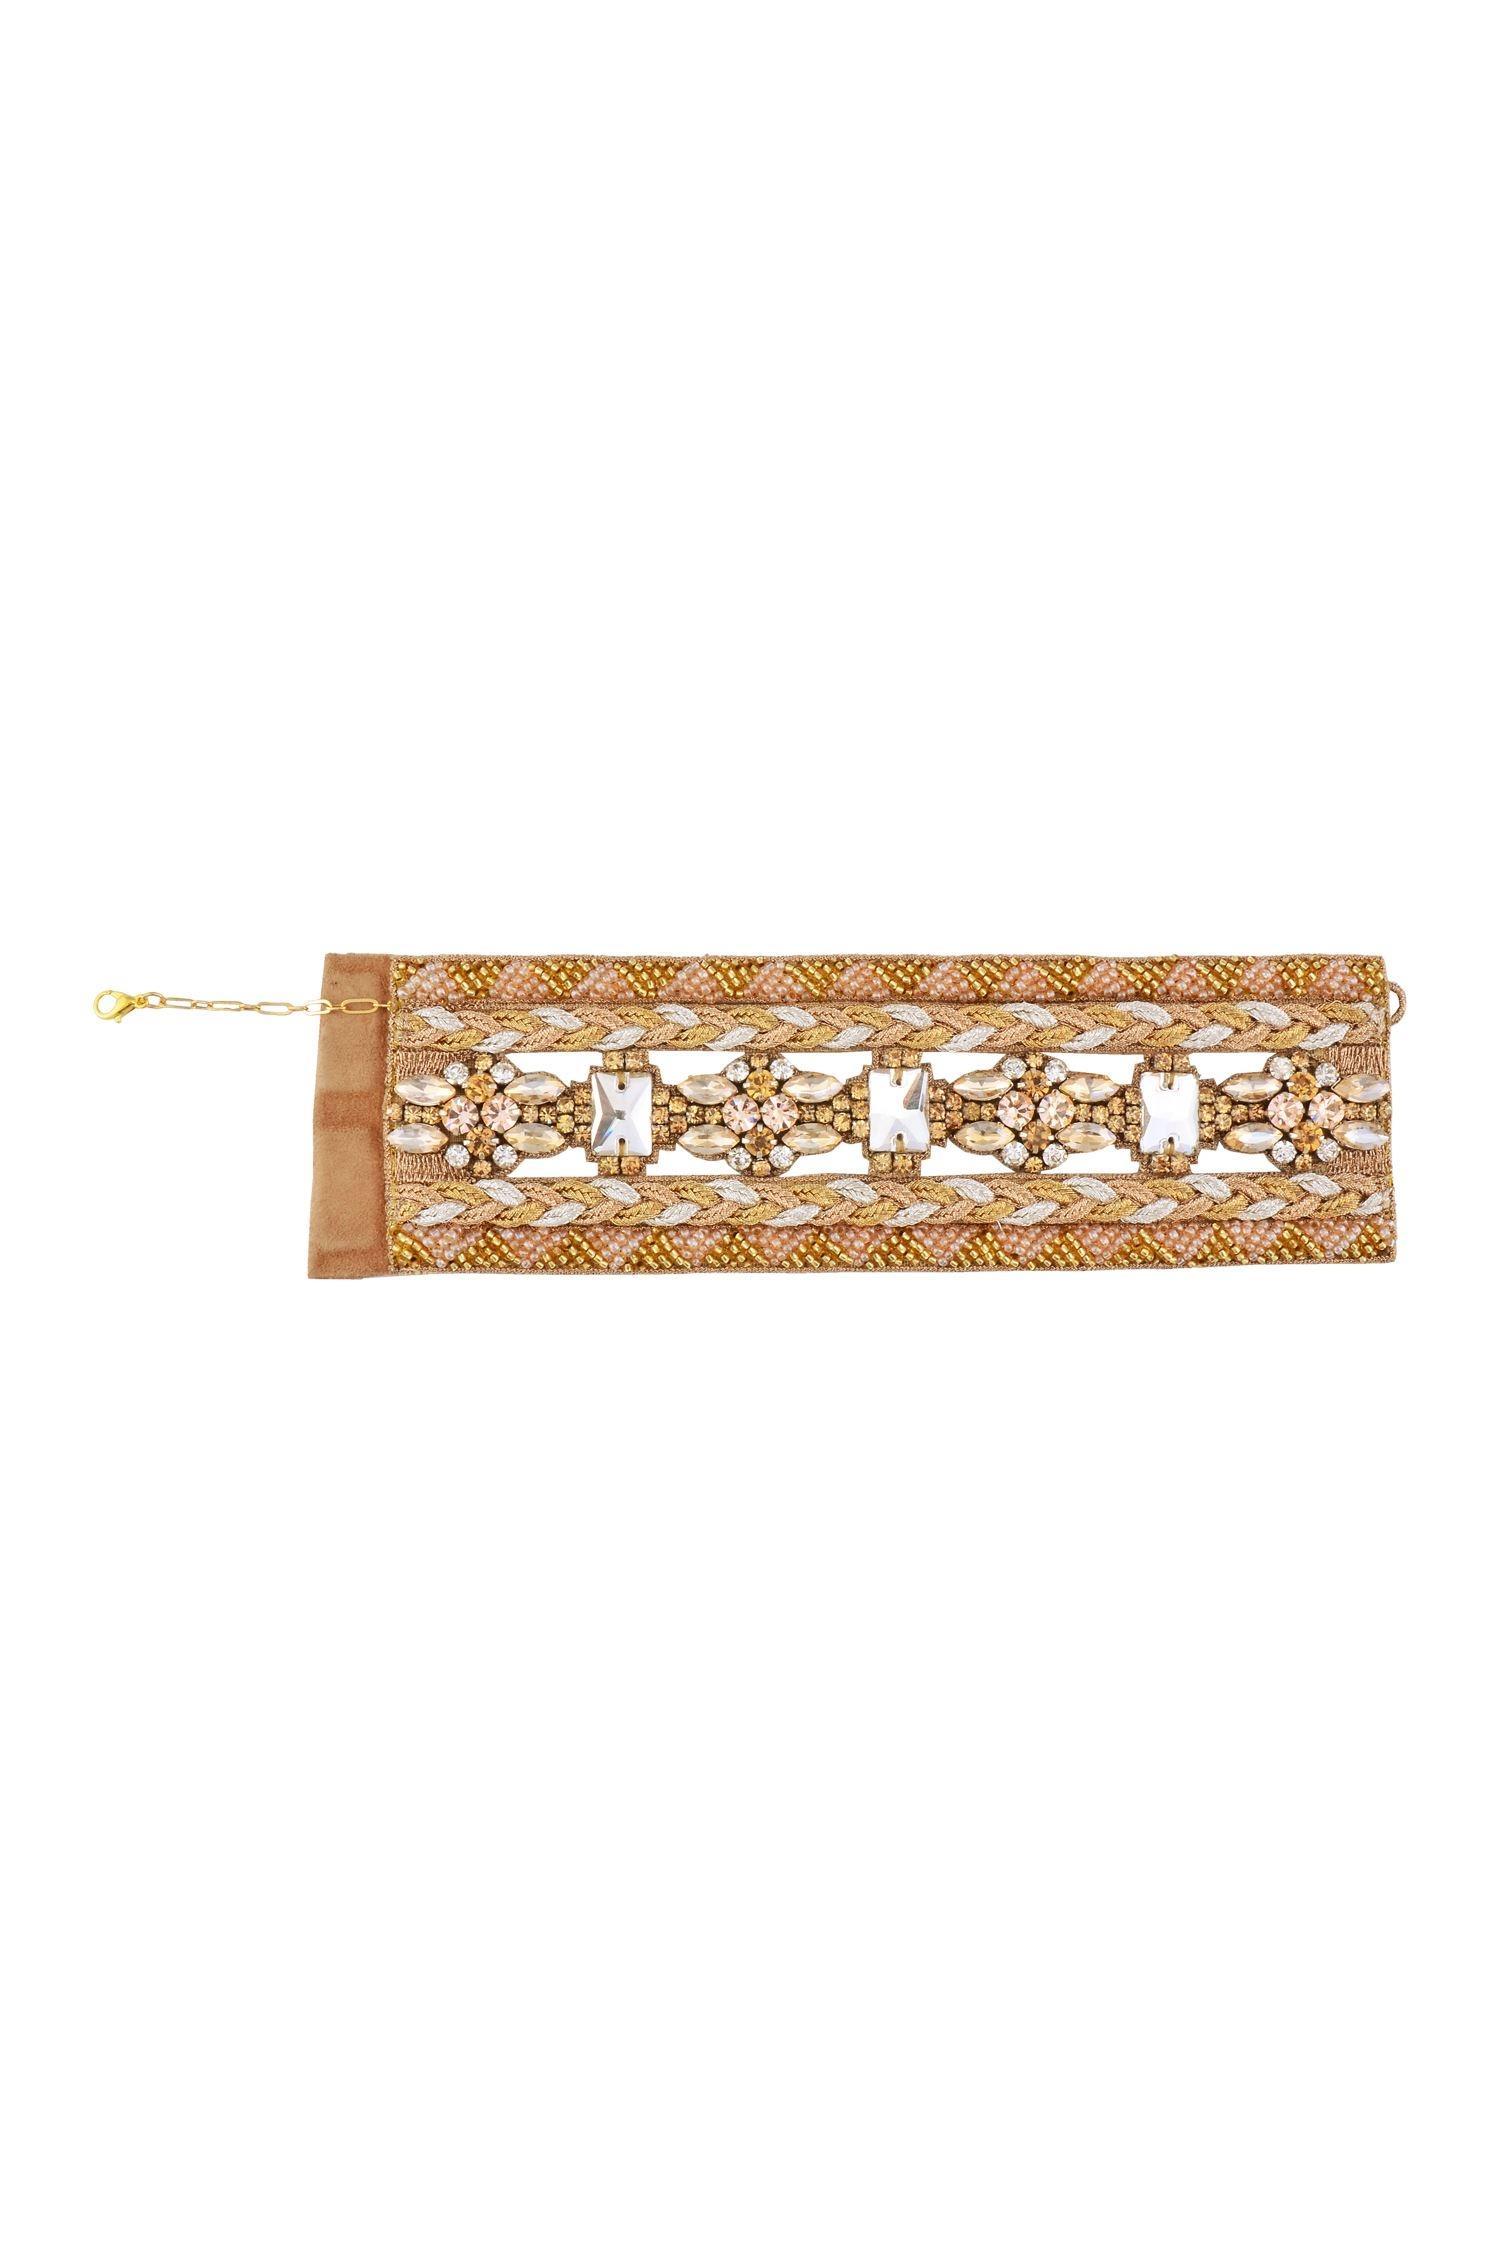 Deepa GurnaniMetallic gold, silver & copper crystal bracelet